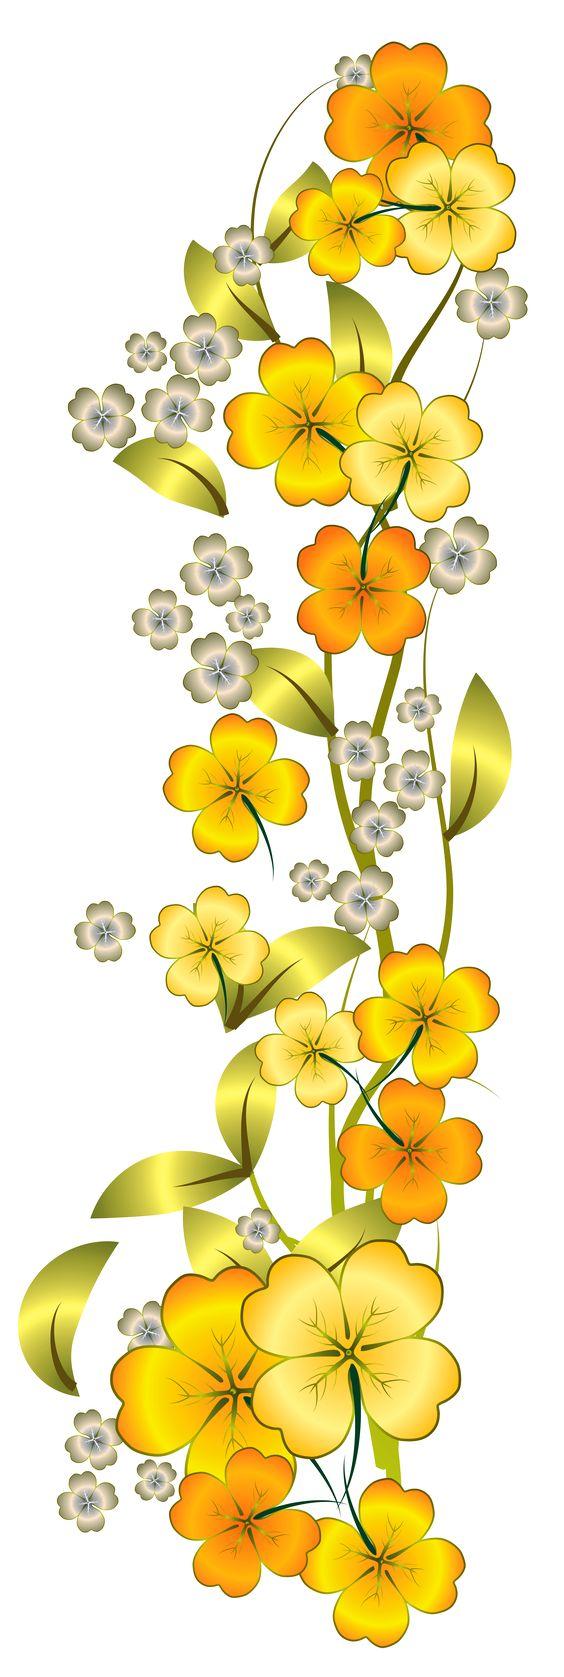 png flower - Buscar con Google